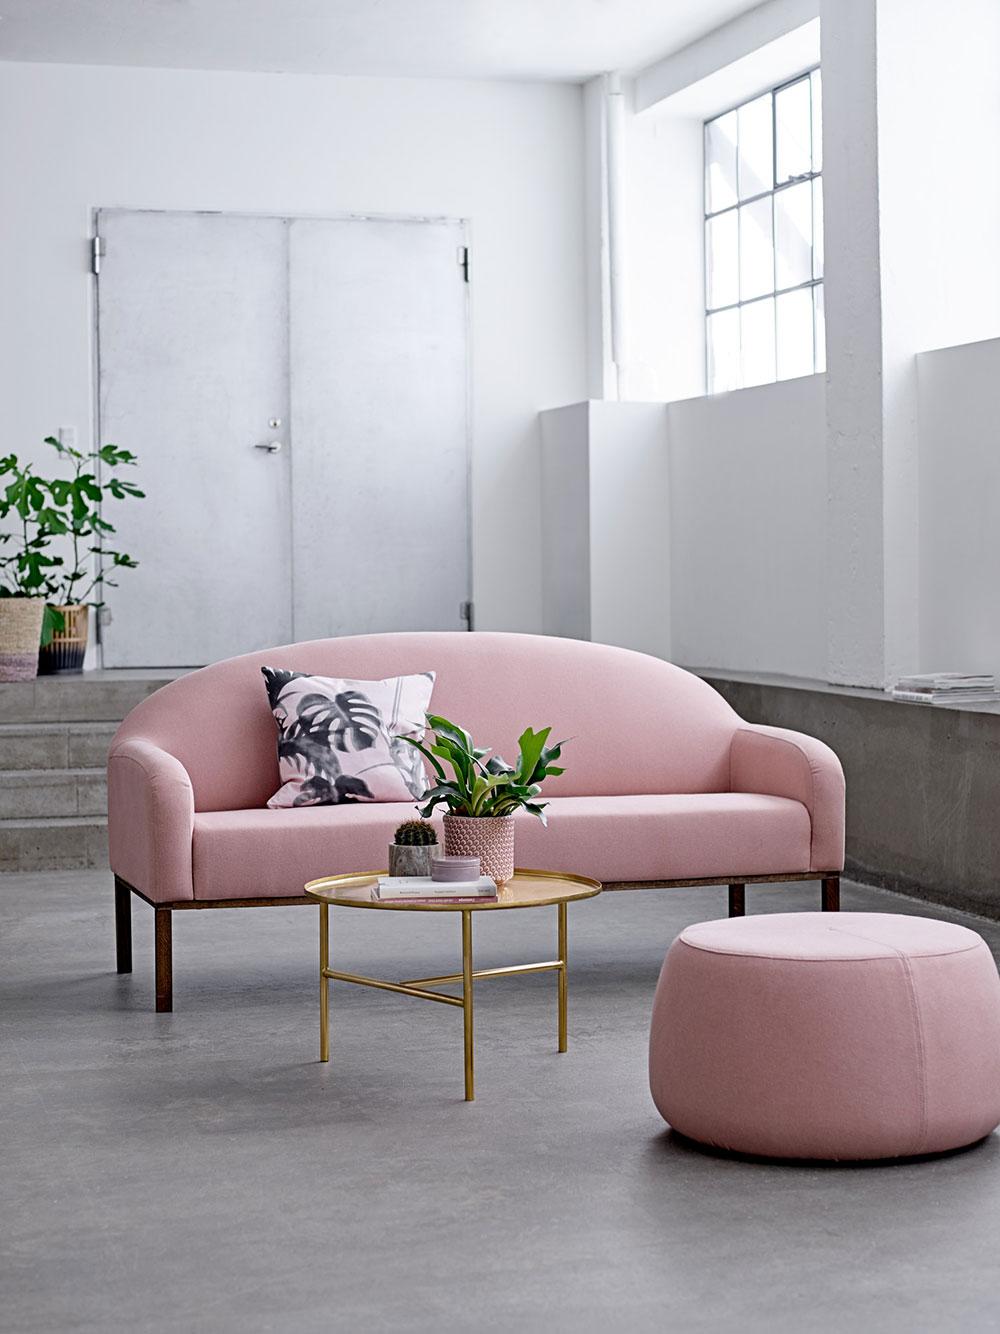 rosa-soffa-bloomingville